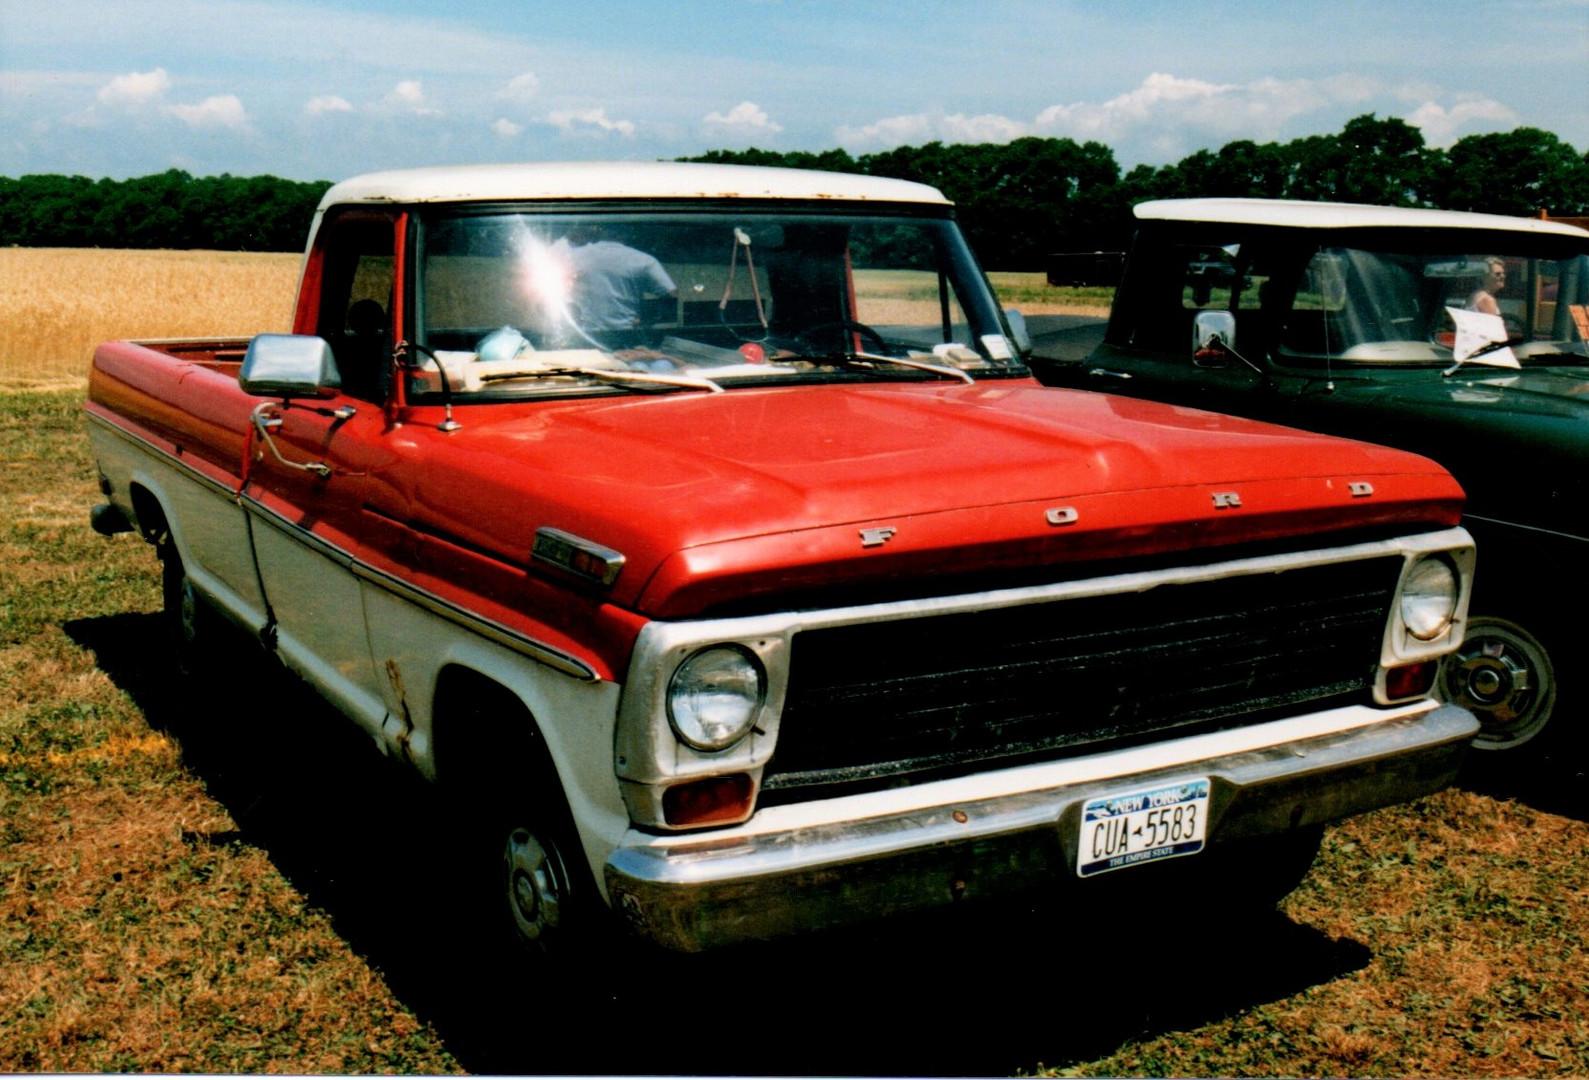 1969 Ford F-100 pickup